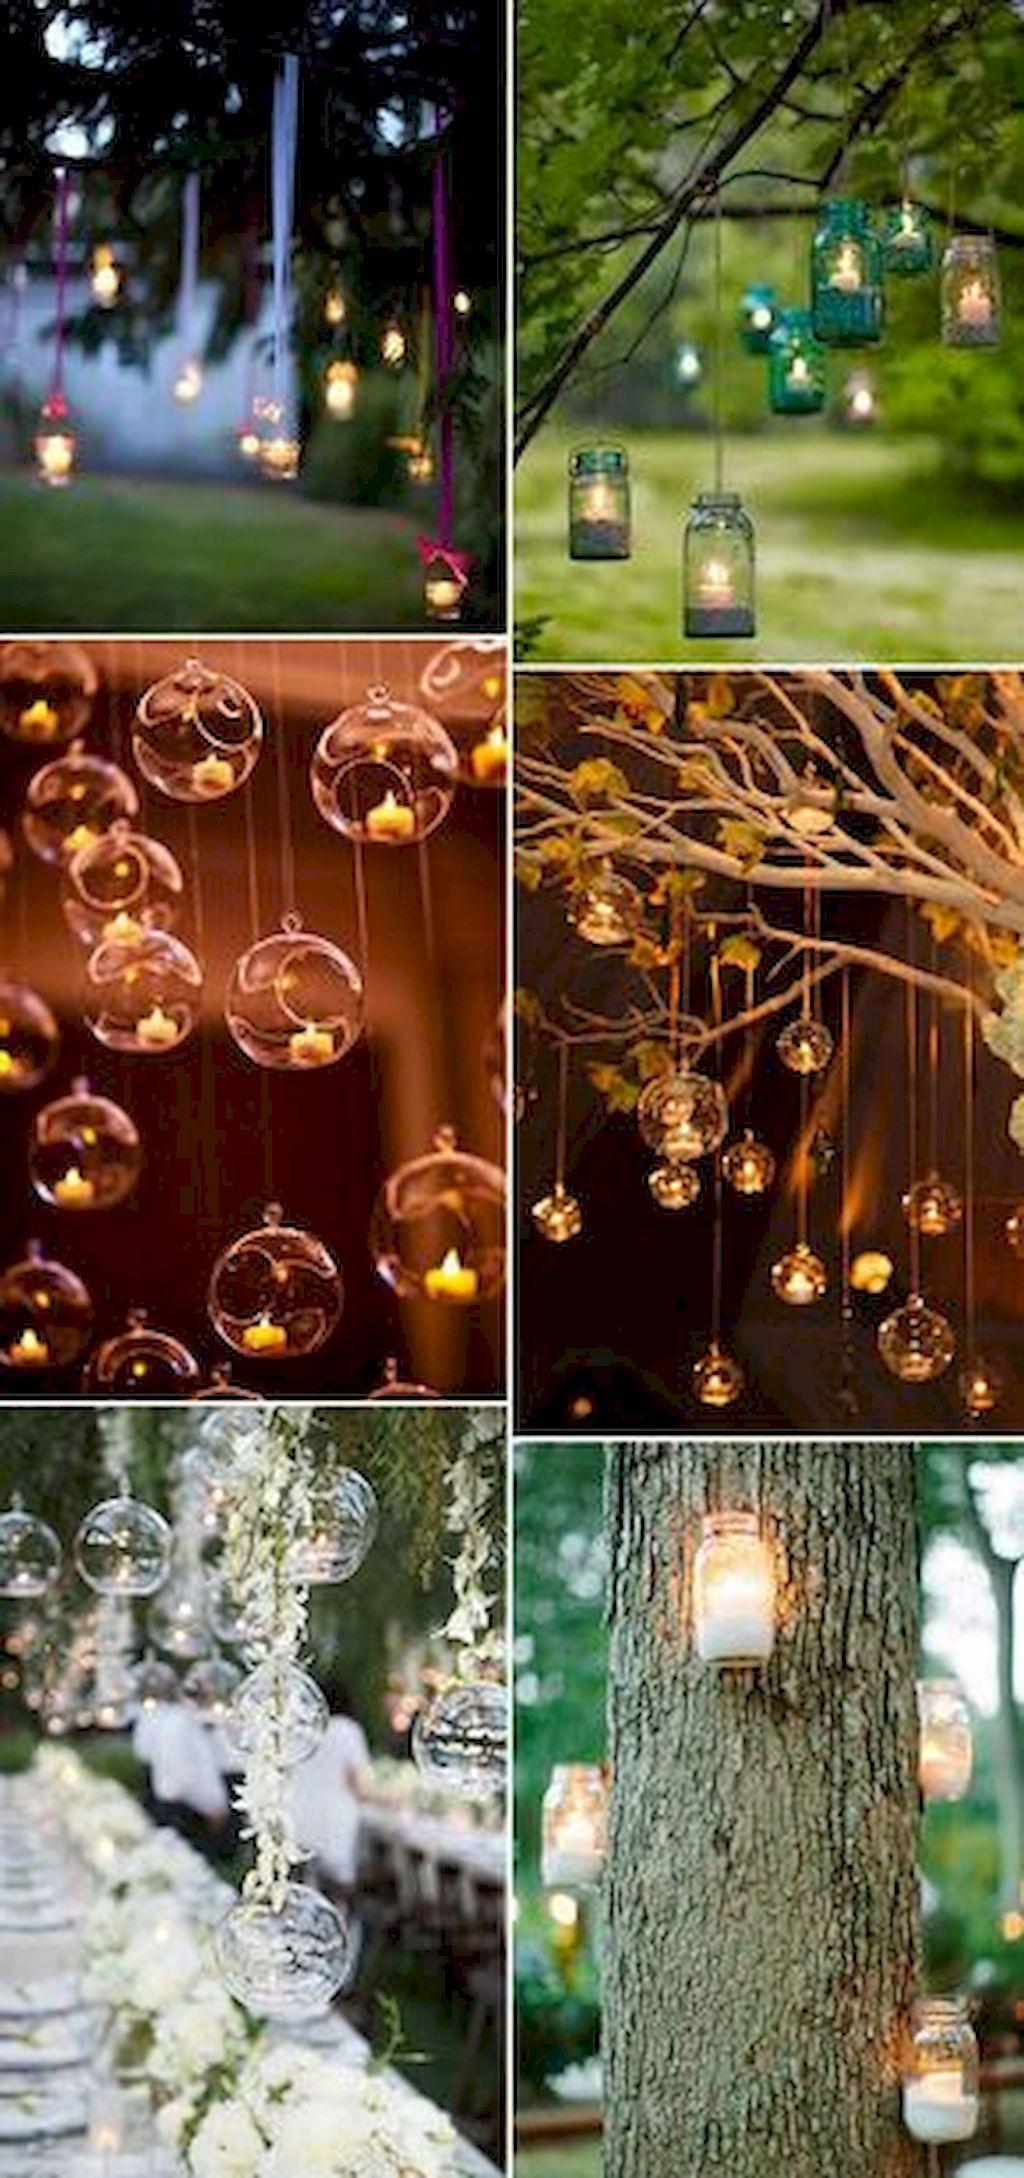 Ideas for wedding decorations outside   Elegant Outdoor Wedding Decor Ideas on A Budget  Pinterest